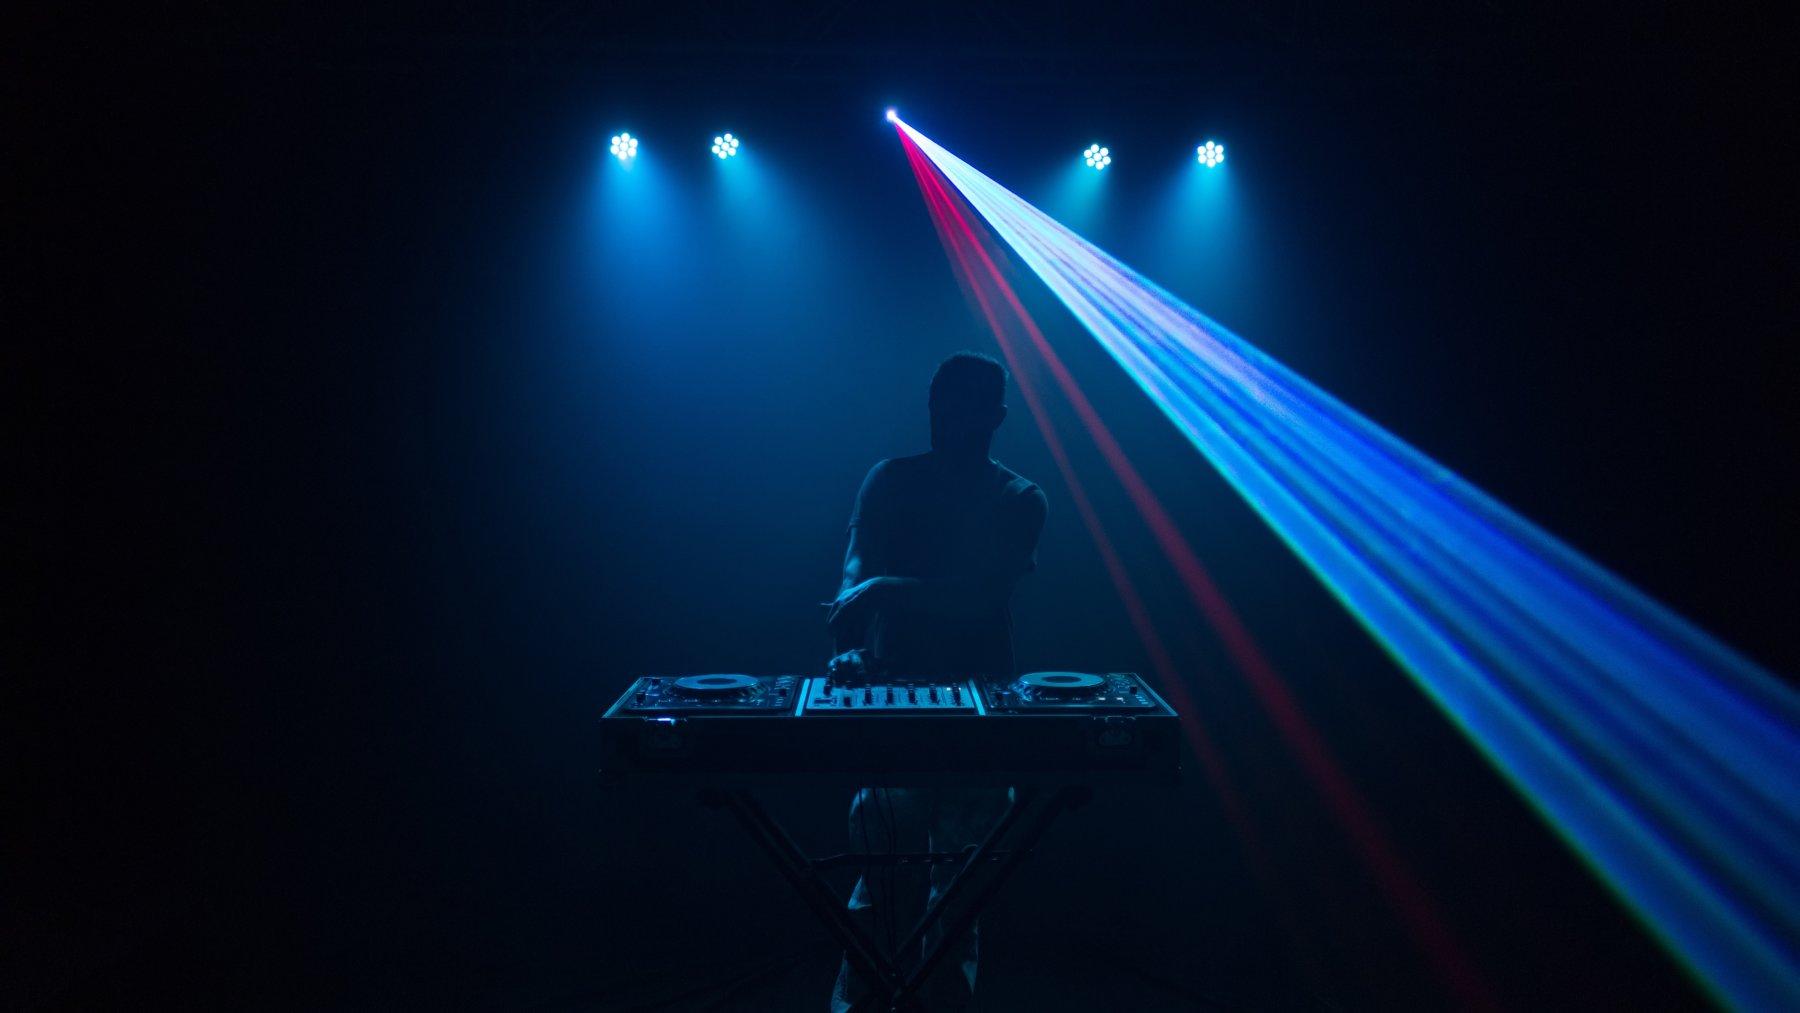 A DJ Performs At An Online Silent Disco Event